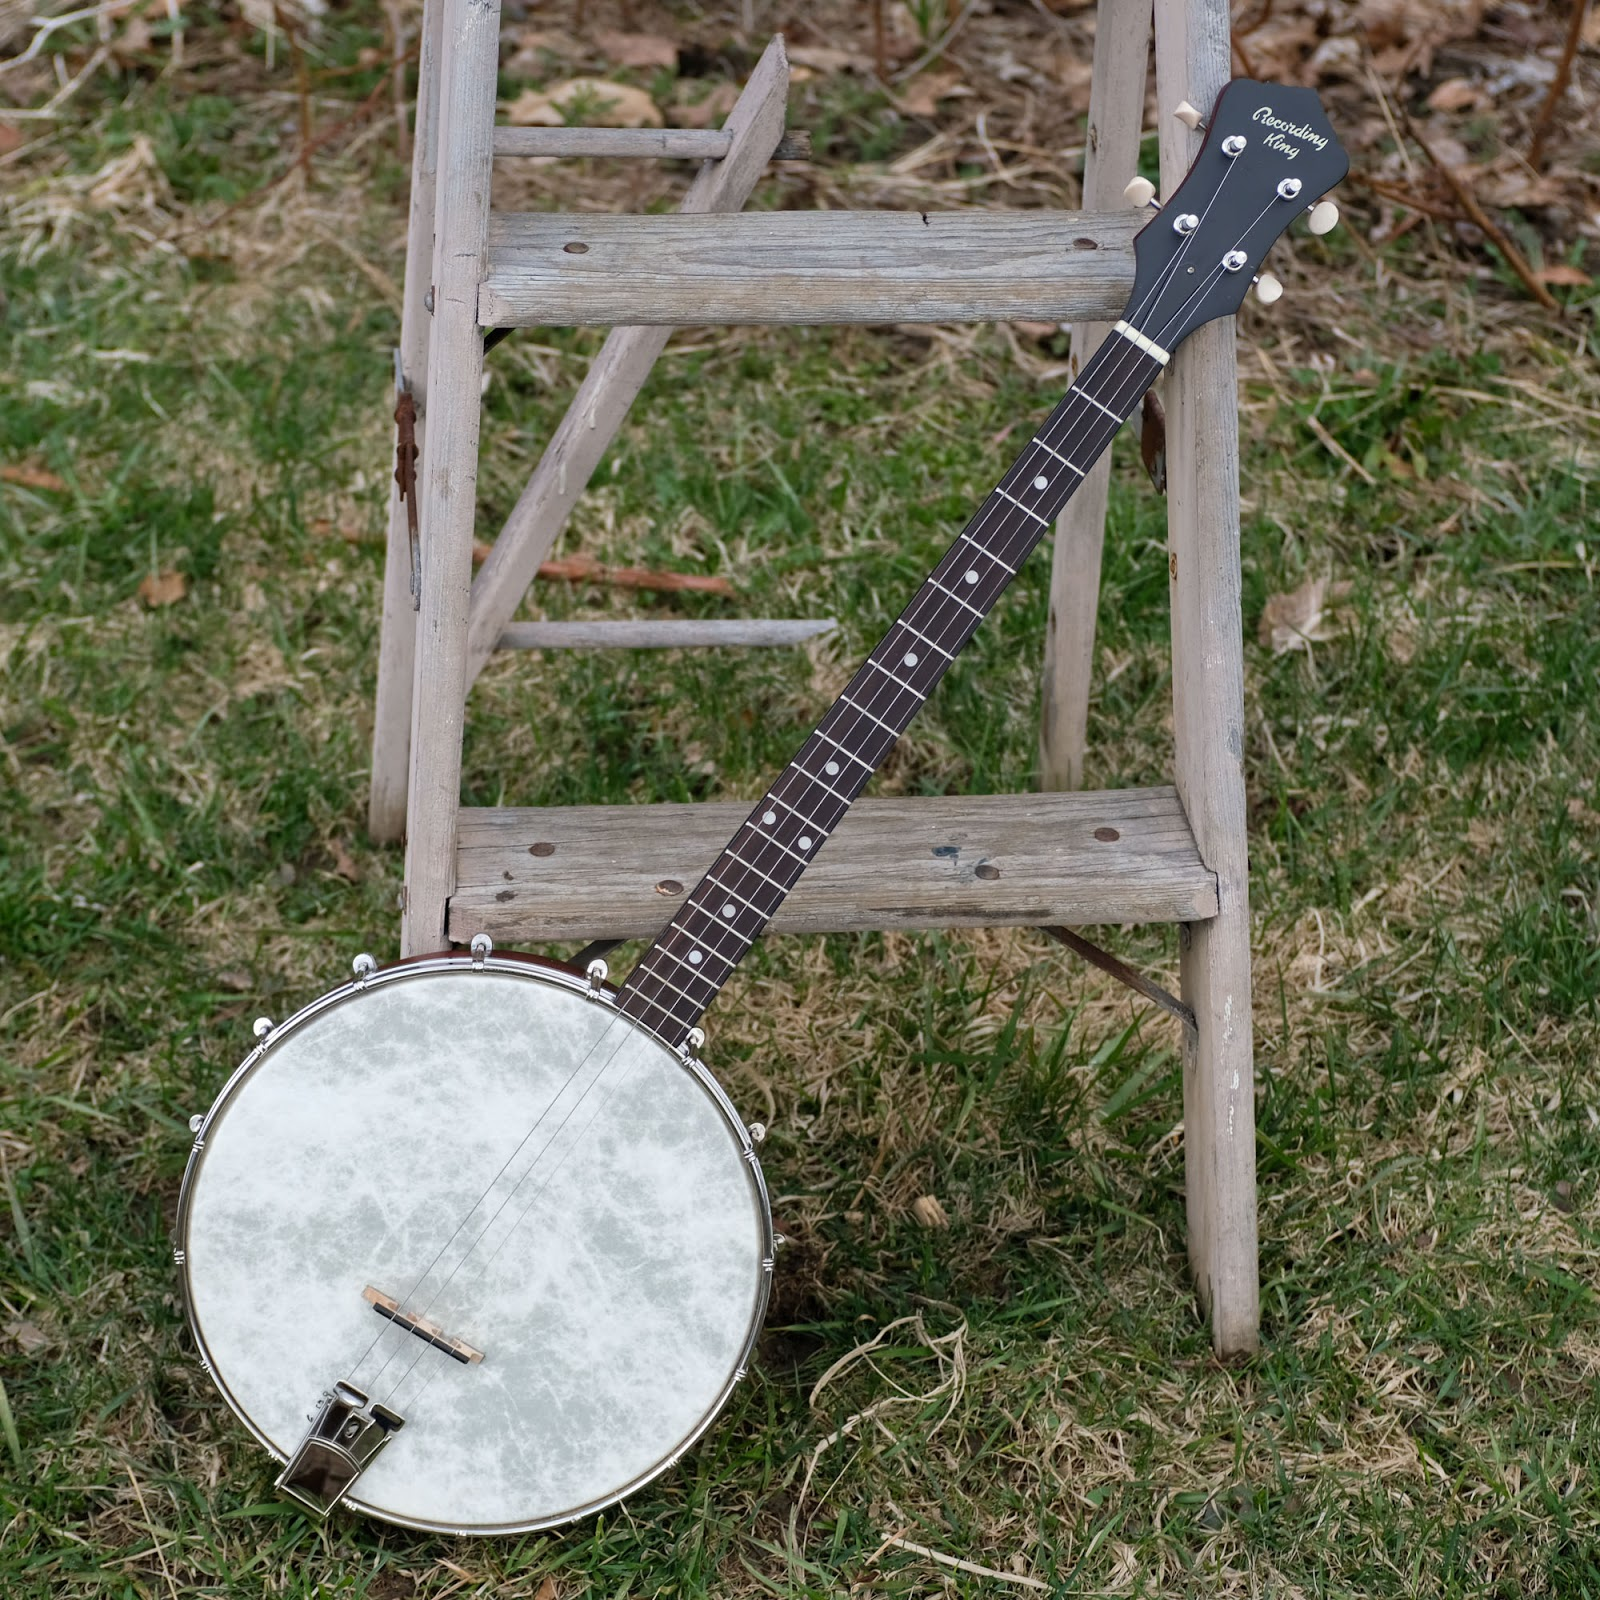 2017 Recording King RKT-05 Dirty 30s Tenor Banjo